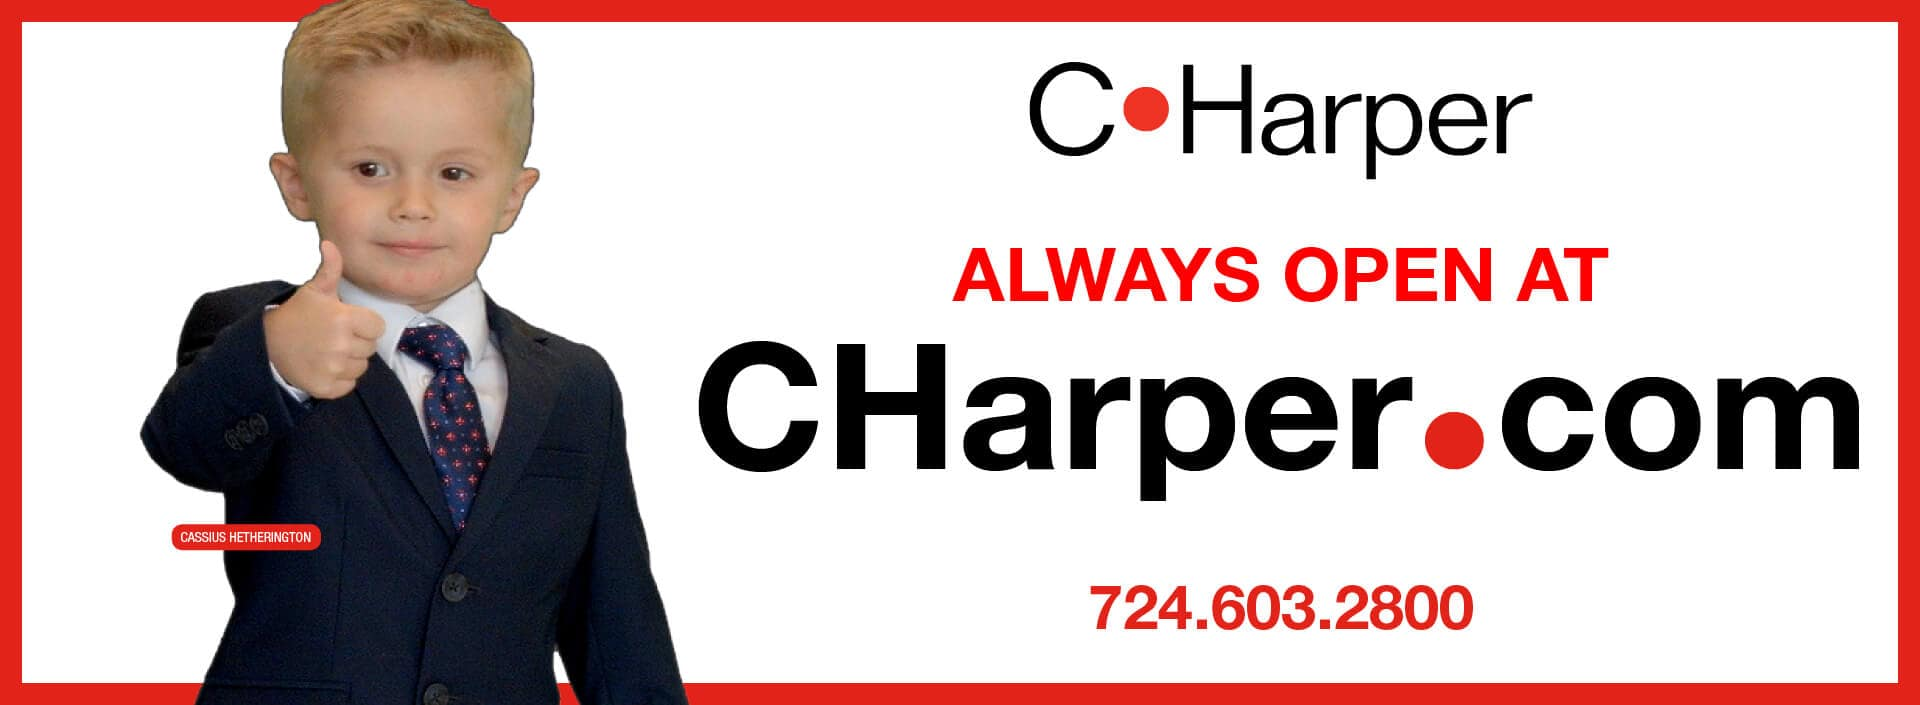 Always Open at CHarper.com